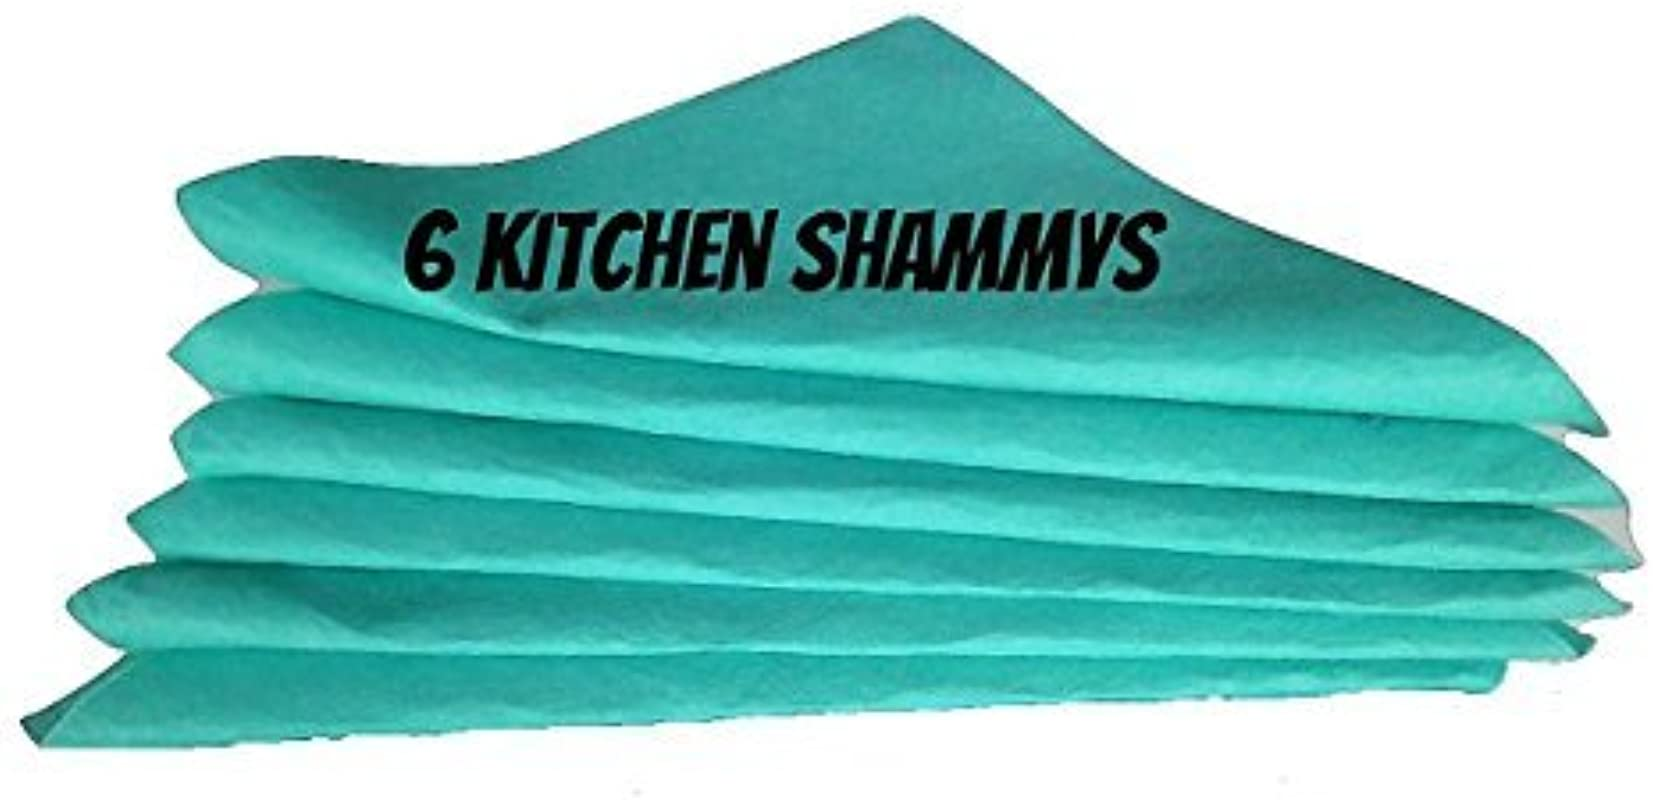 Chamois Shammy 6 Pack 16 X 16 Super Absorbent Kitchen Shammy 1 27 X 20 Super Shammy 260 Gram 1 Bonus Microfiber Towel